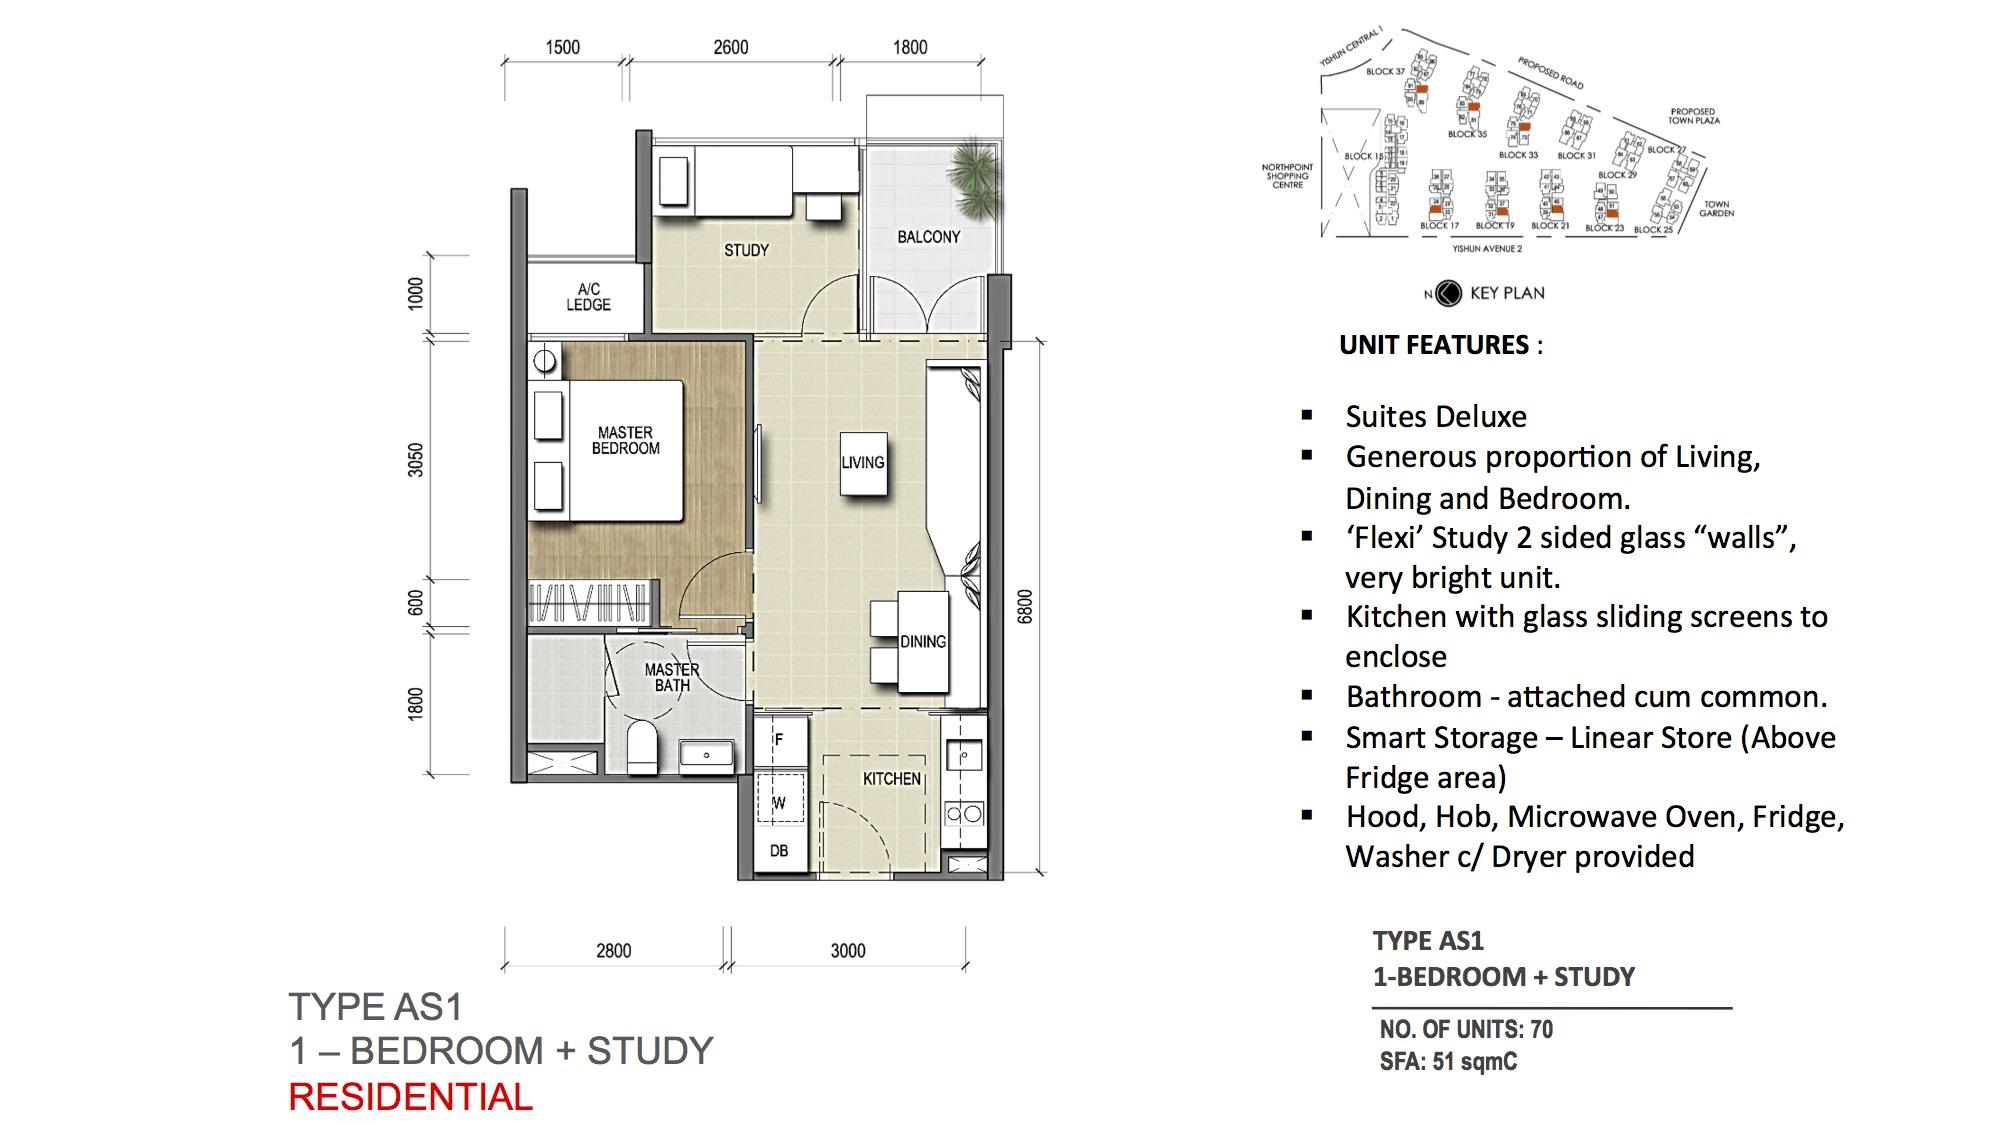 TYPE AS1 1-Bedroom + Study